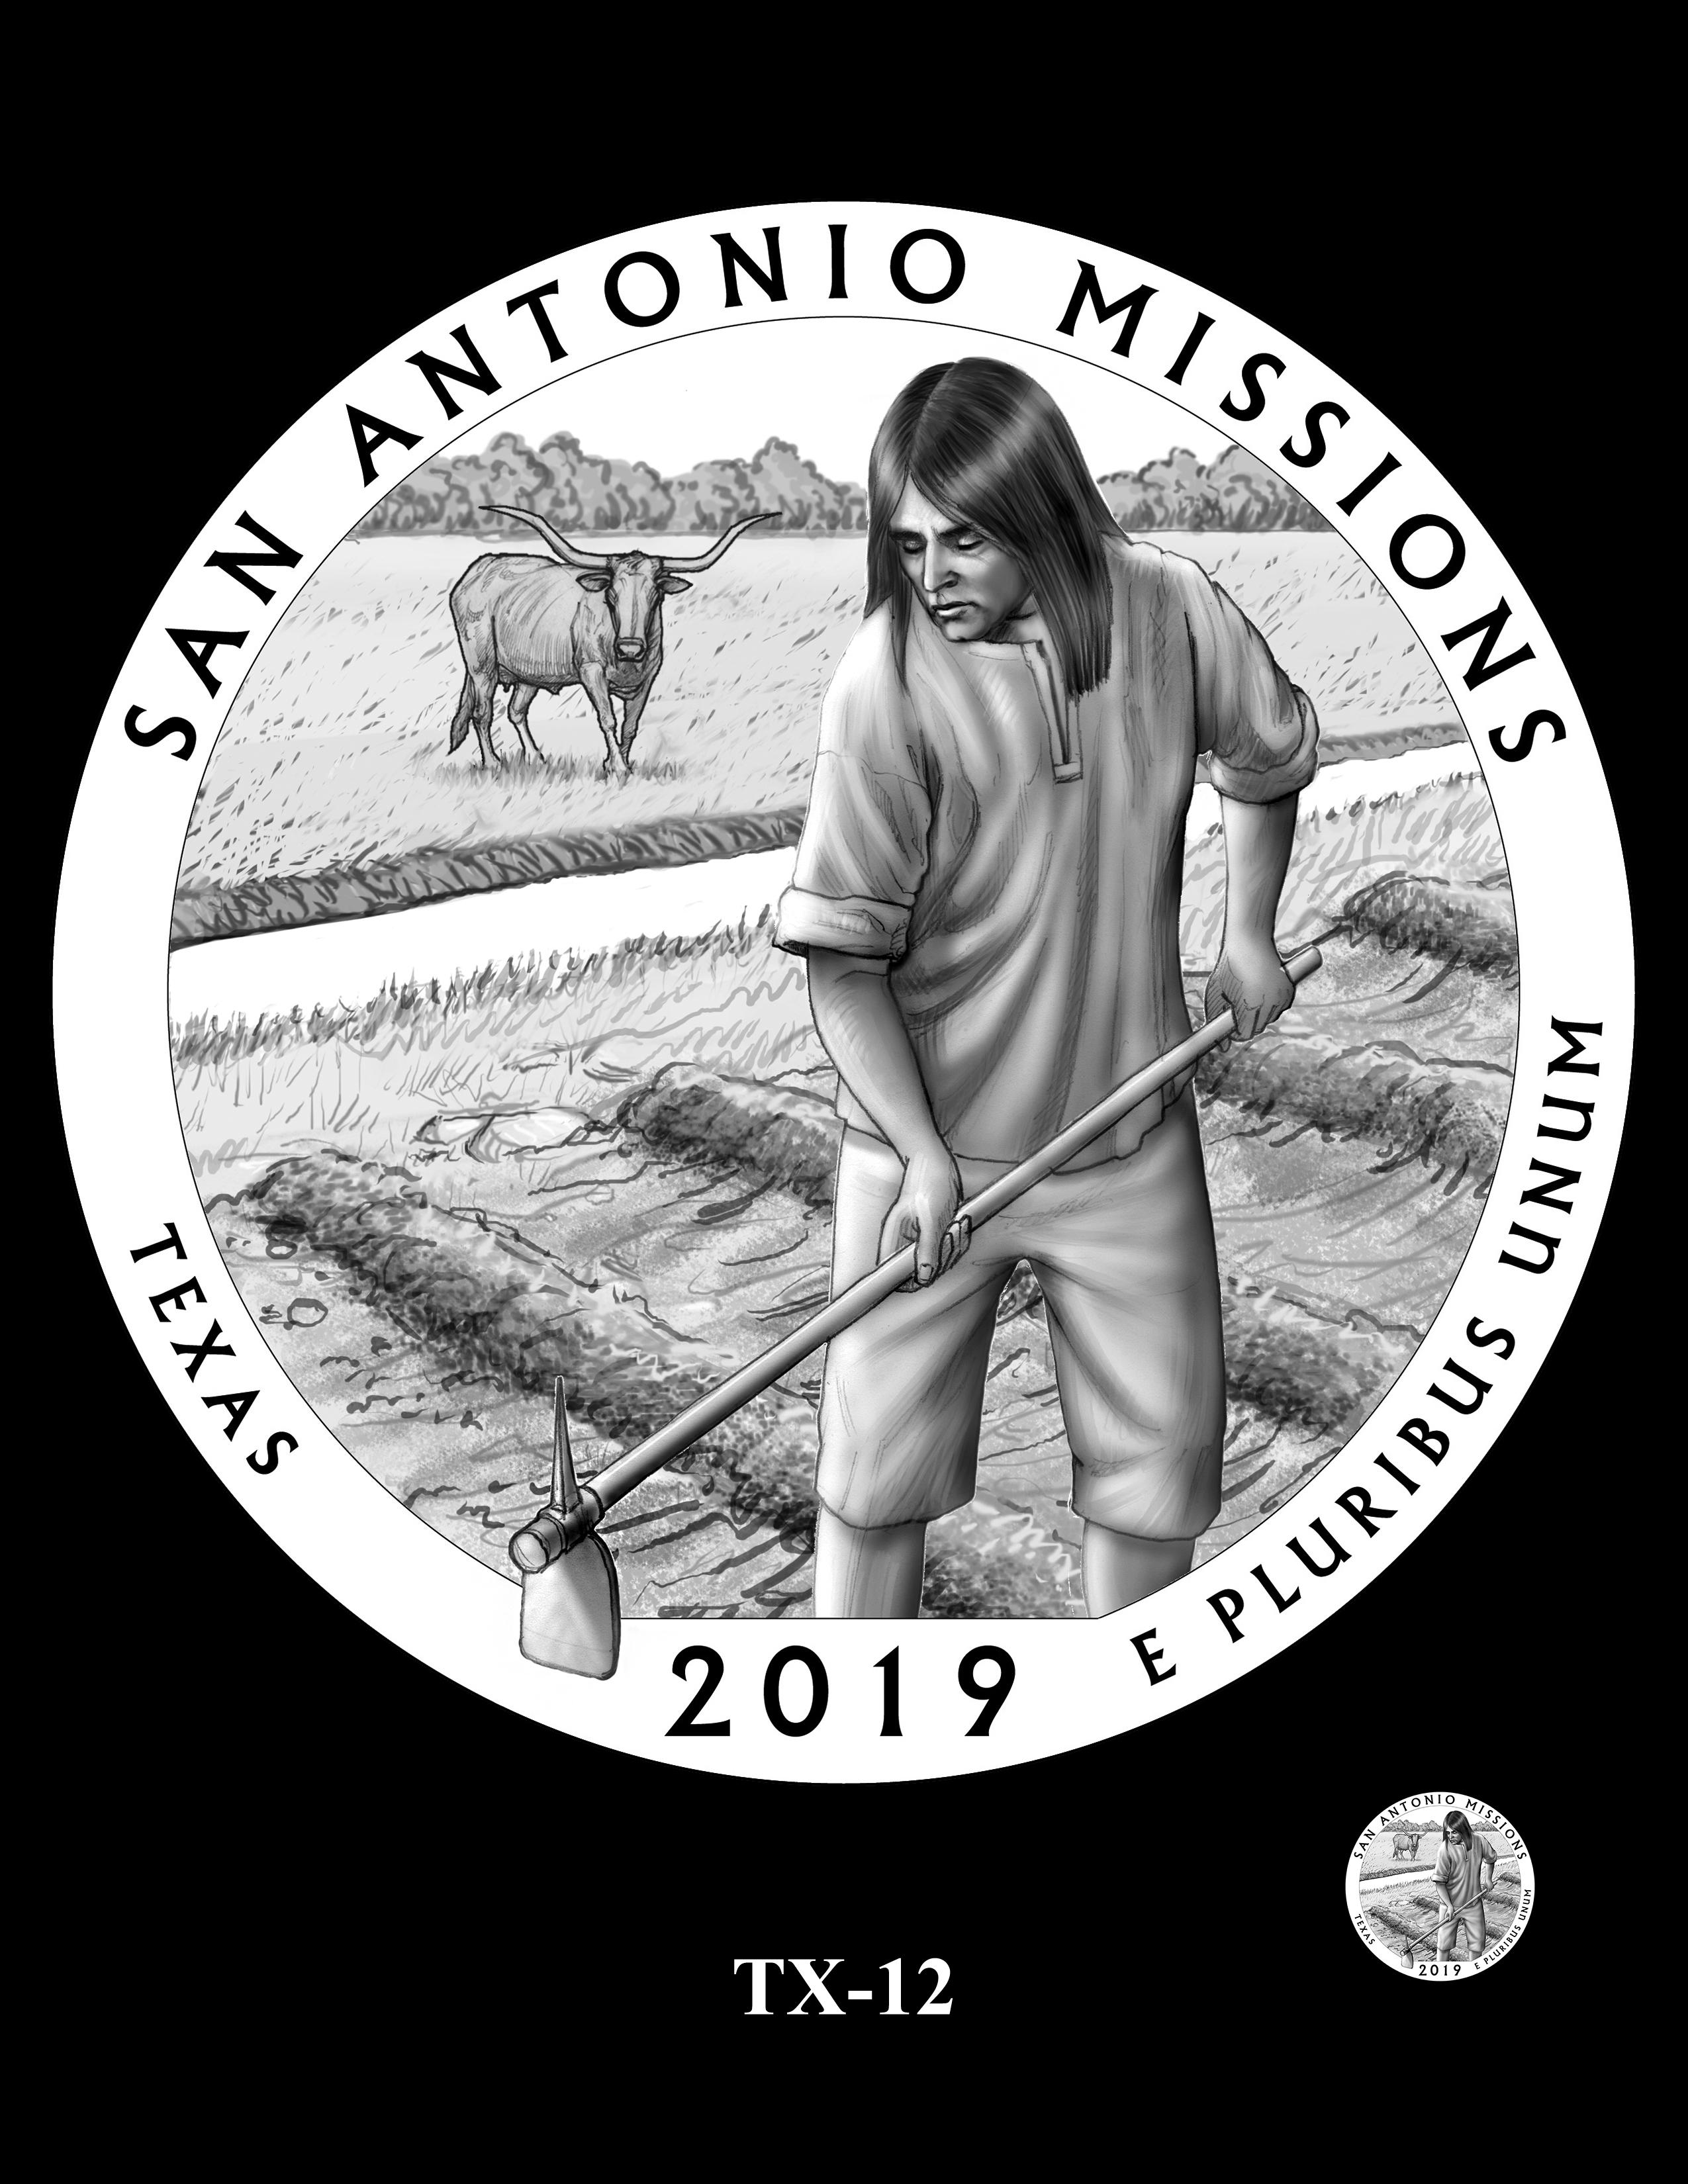 TX-12 -- 2019 America the Beautiful Quarters® Program